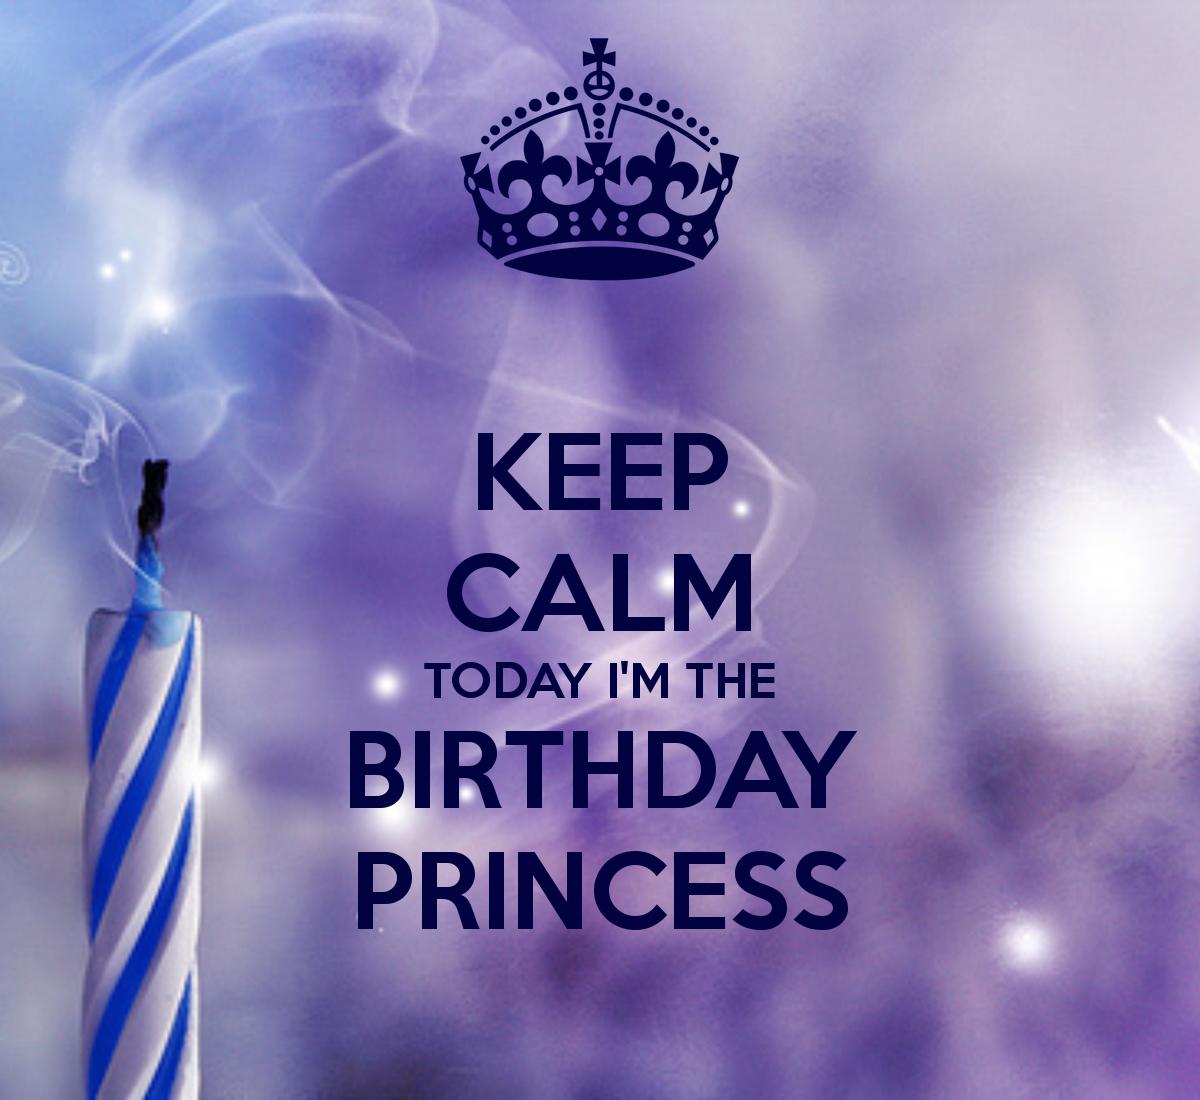 KEEP CALM TODAY I'M THE BIRTHDAY PRINCESS Happy birthday